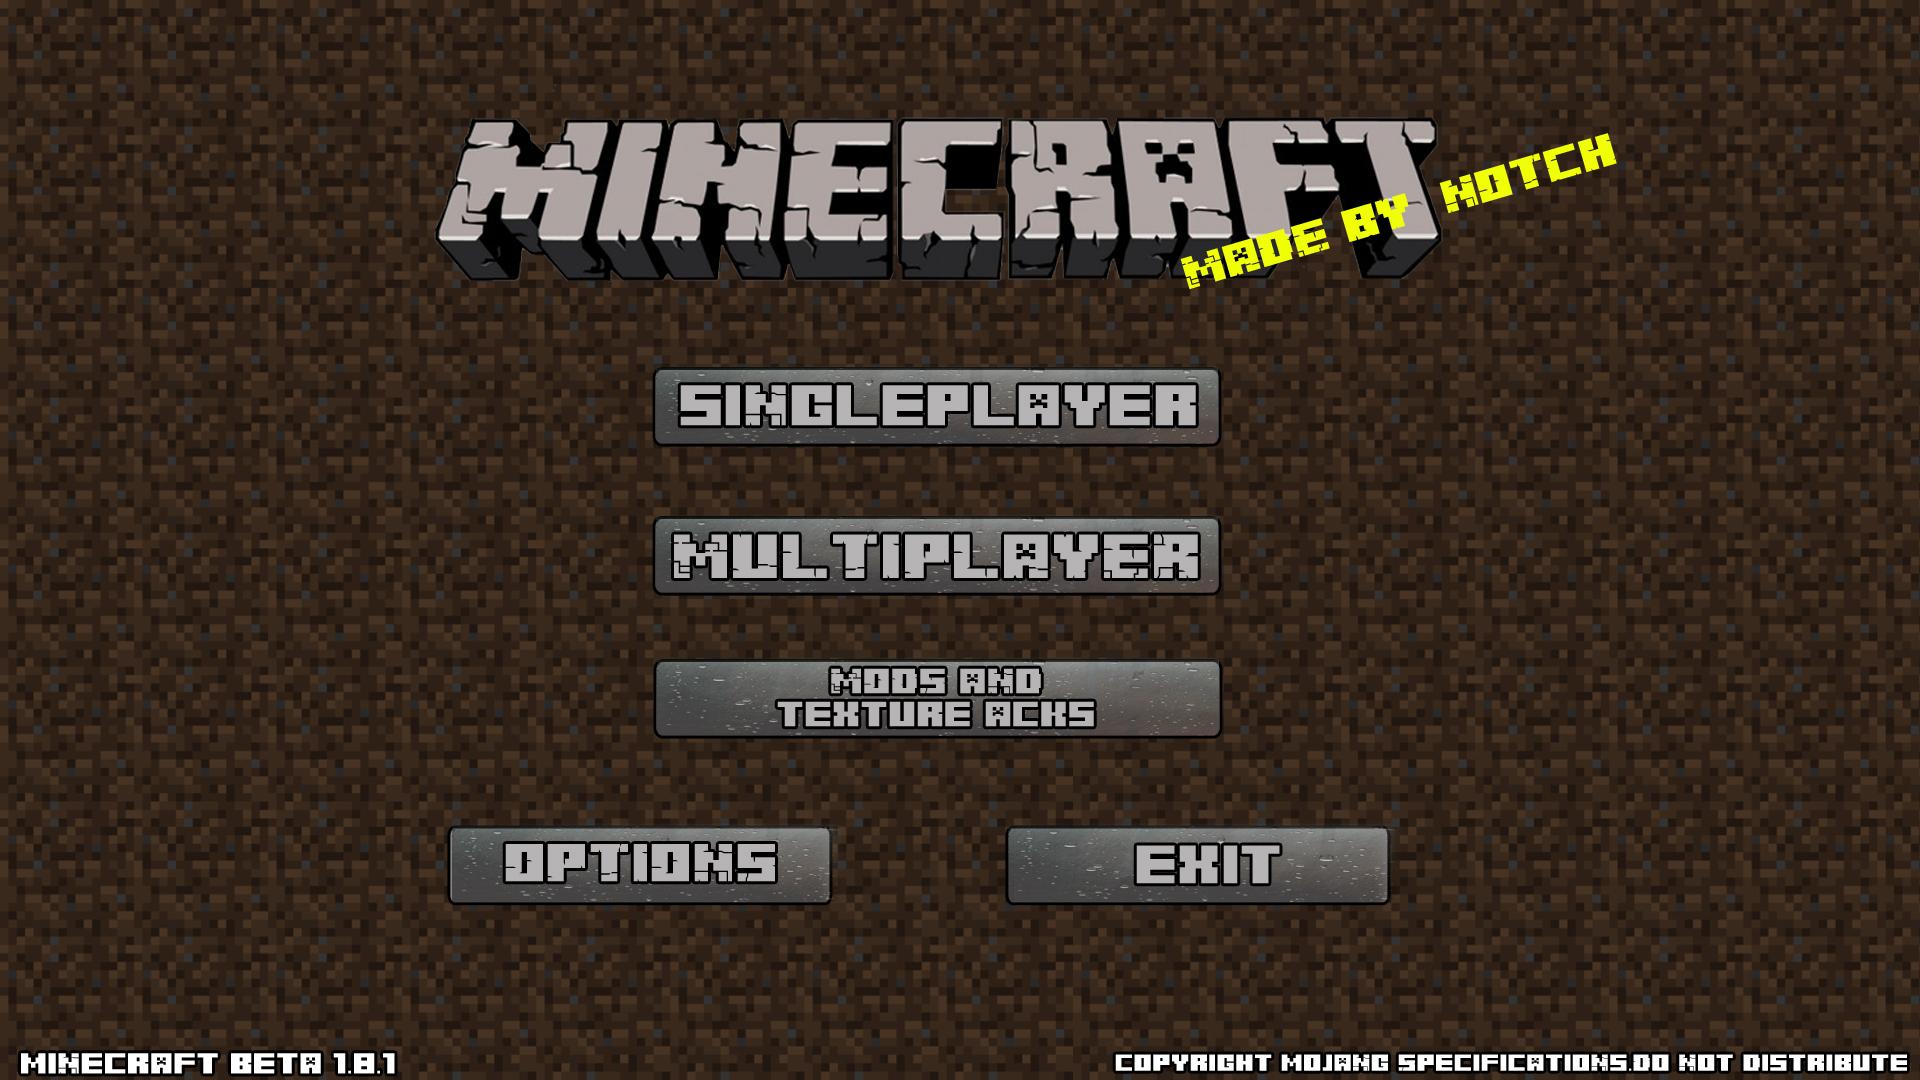 Best Wallpaper Minecraft Home Screen - minecraft_home_screen_by_craftersfusion_by_craftersfusion-d5zkshg  You Should Have_1001865.jpg